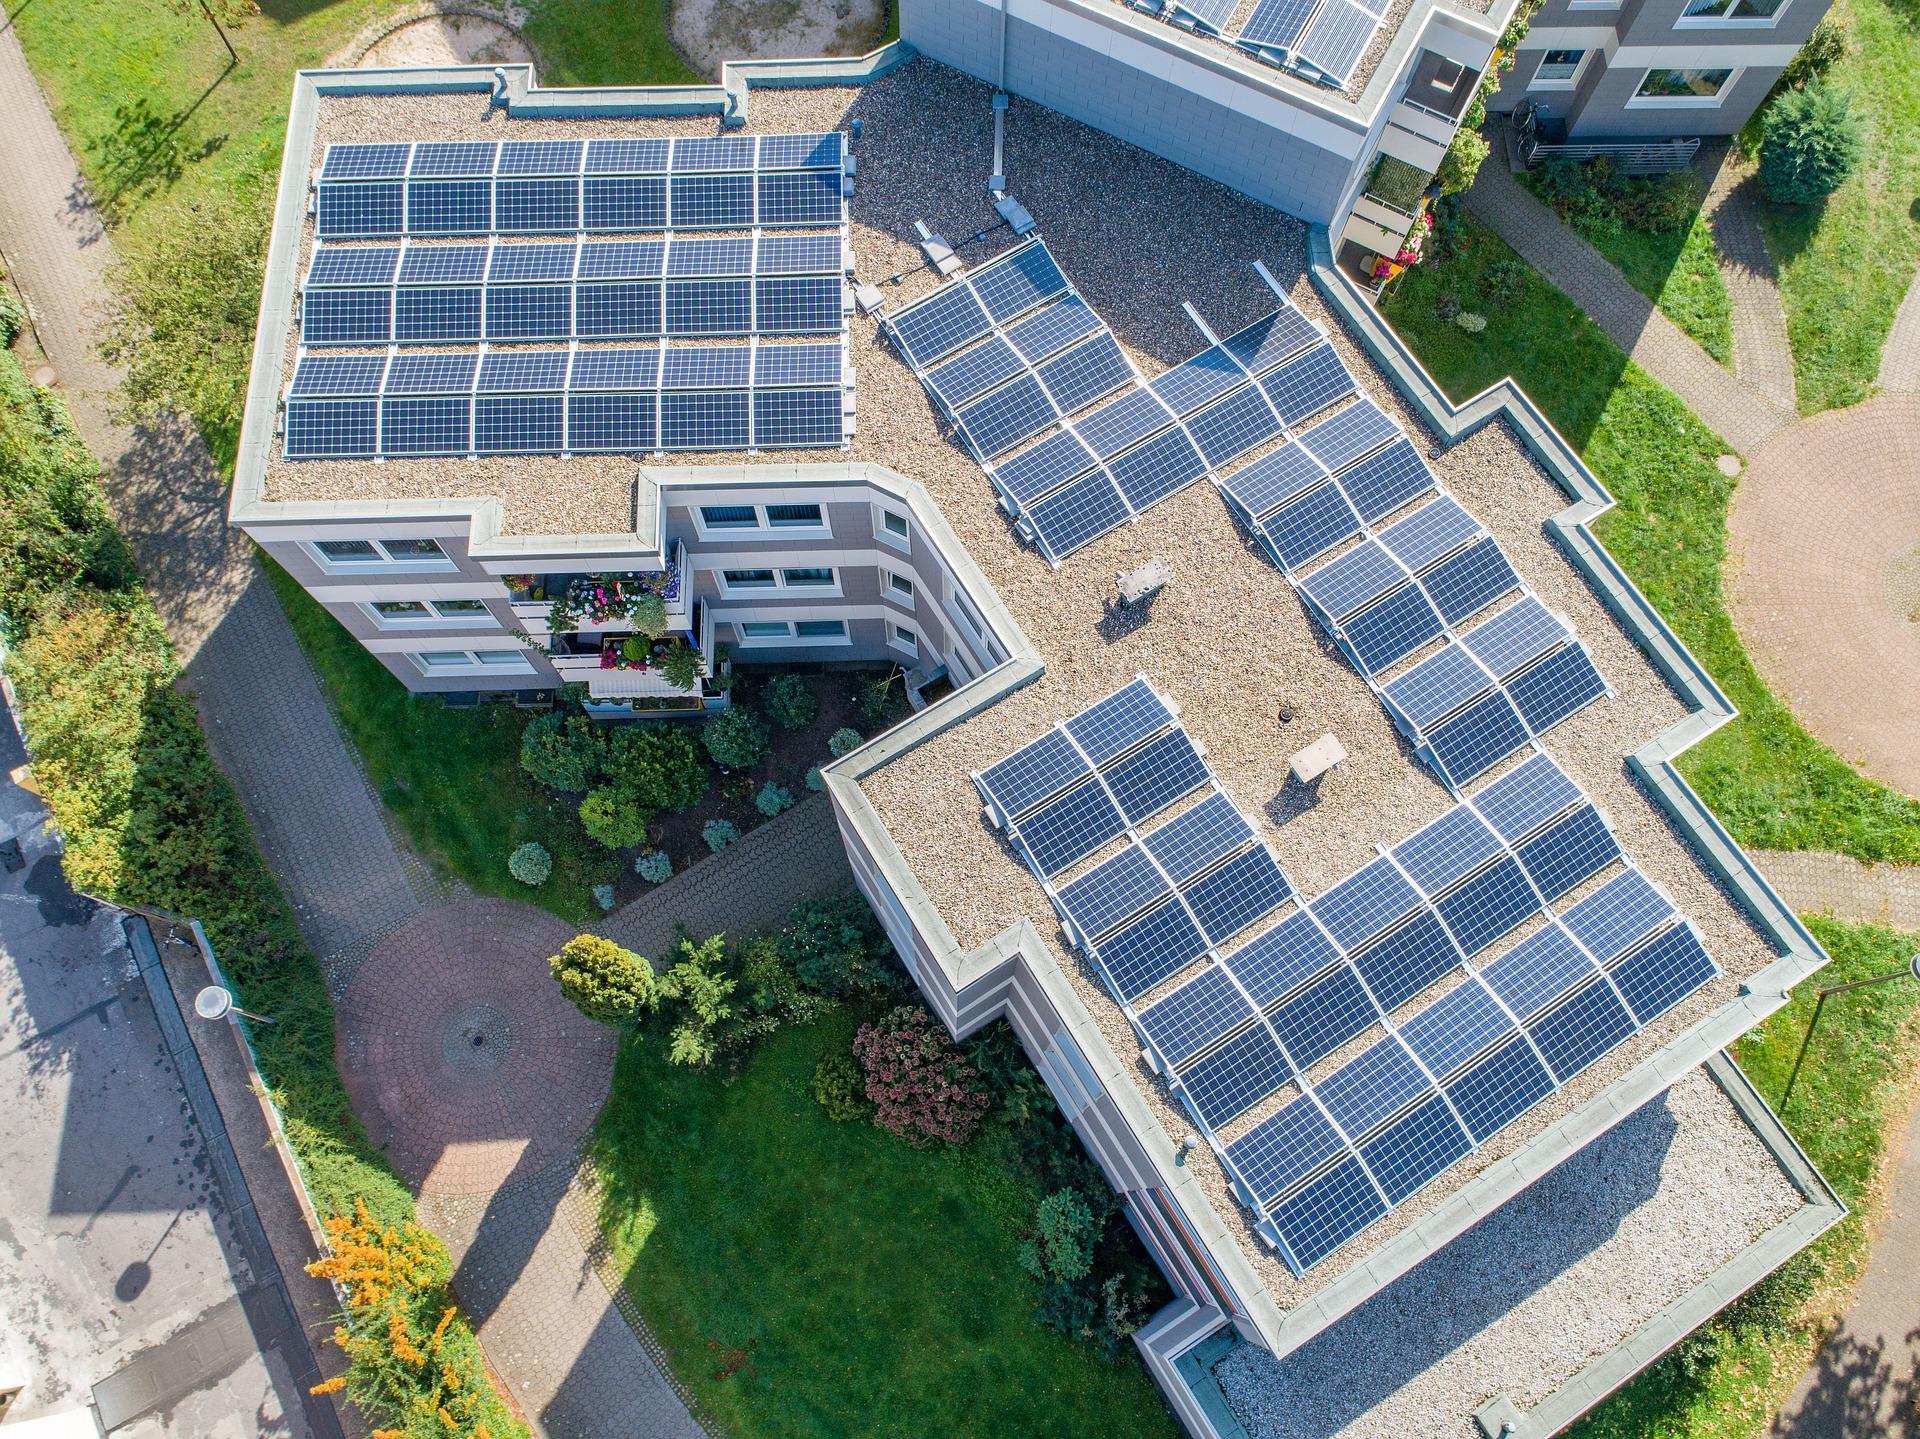 incentivi 110 per cento fotovoltaico detrazioni ecobonus